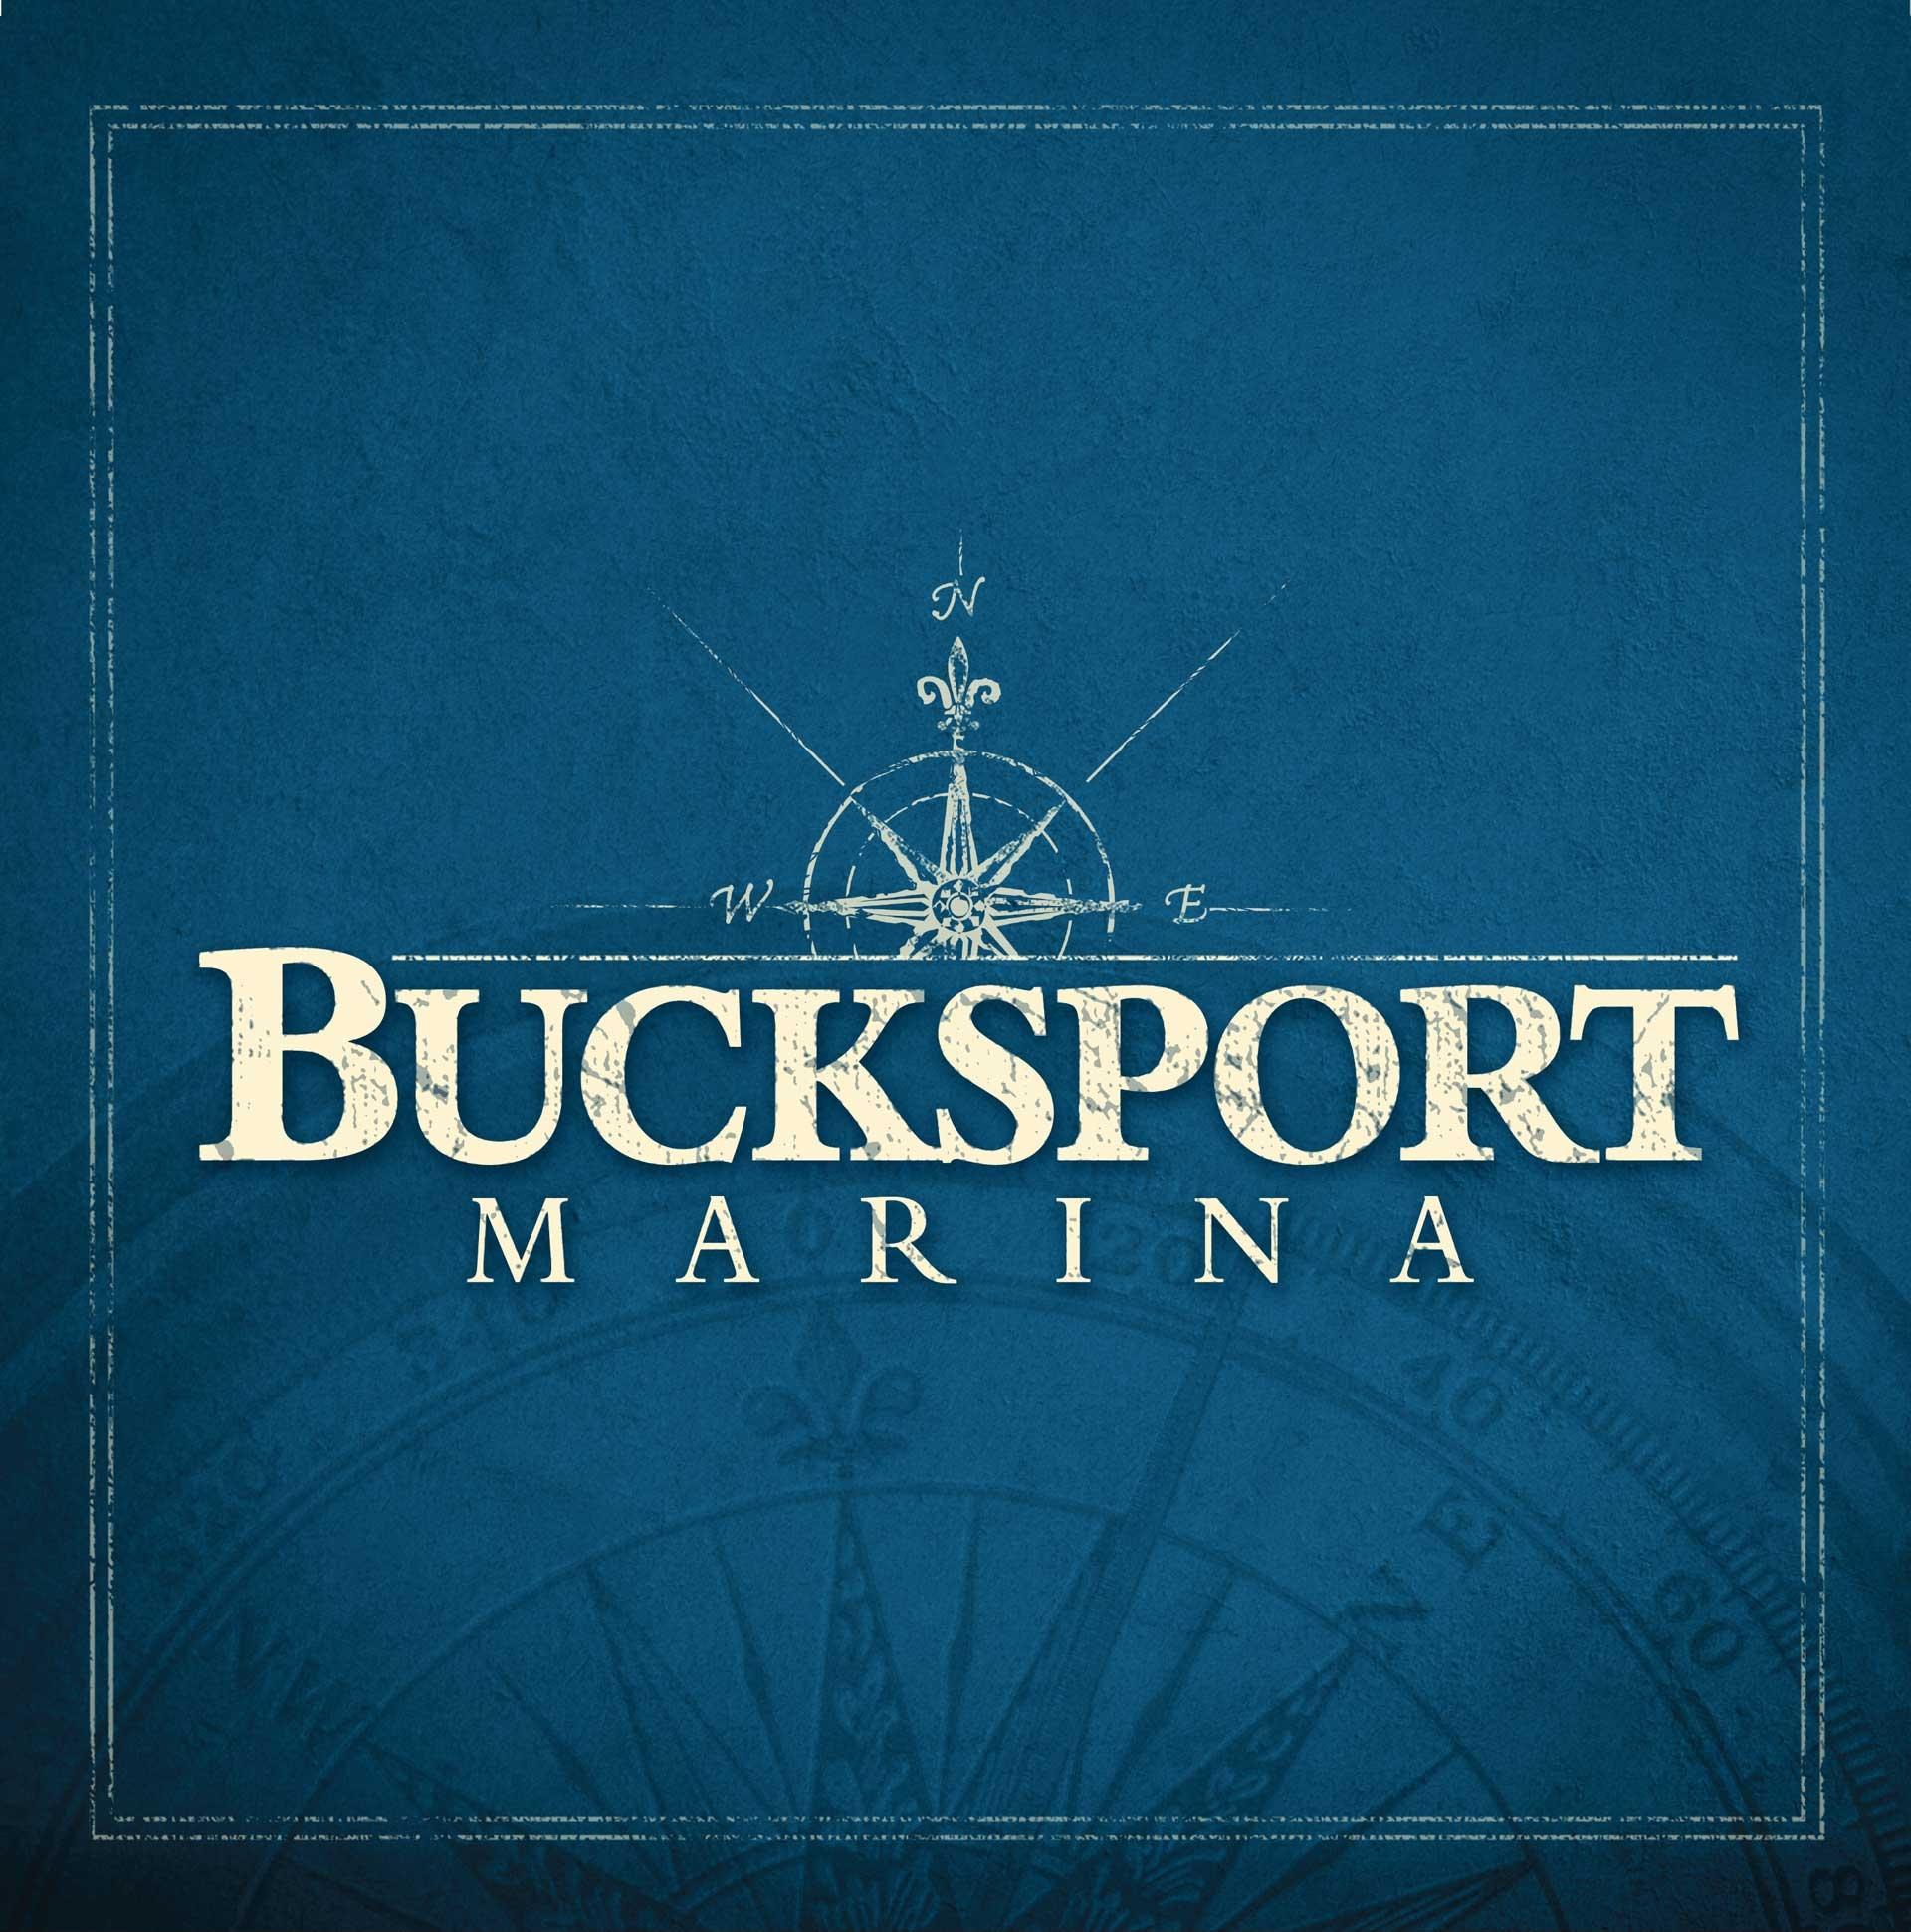 Bucksport Marina Identity